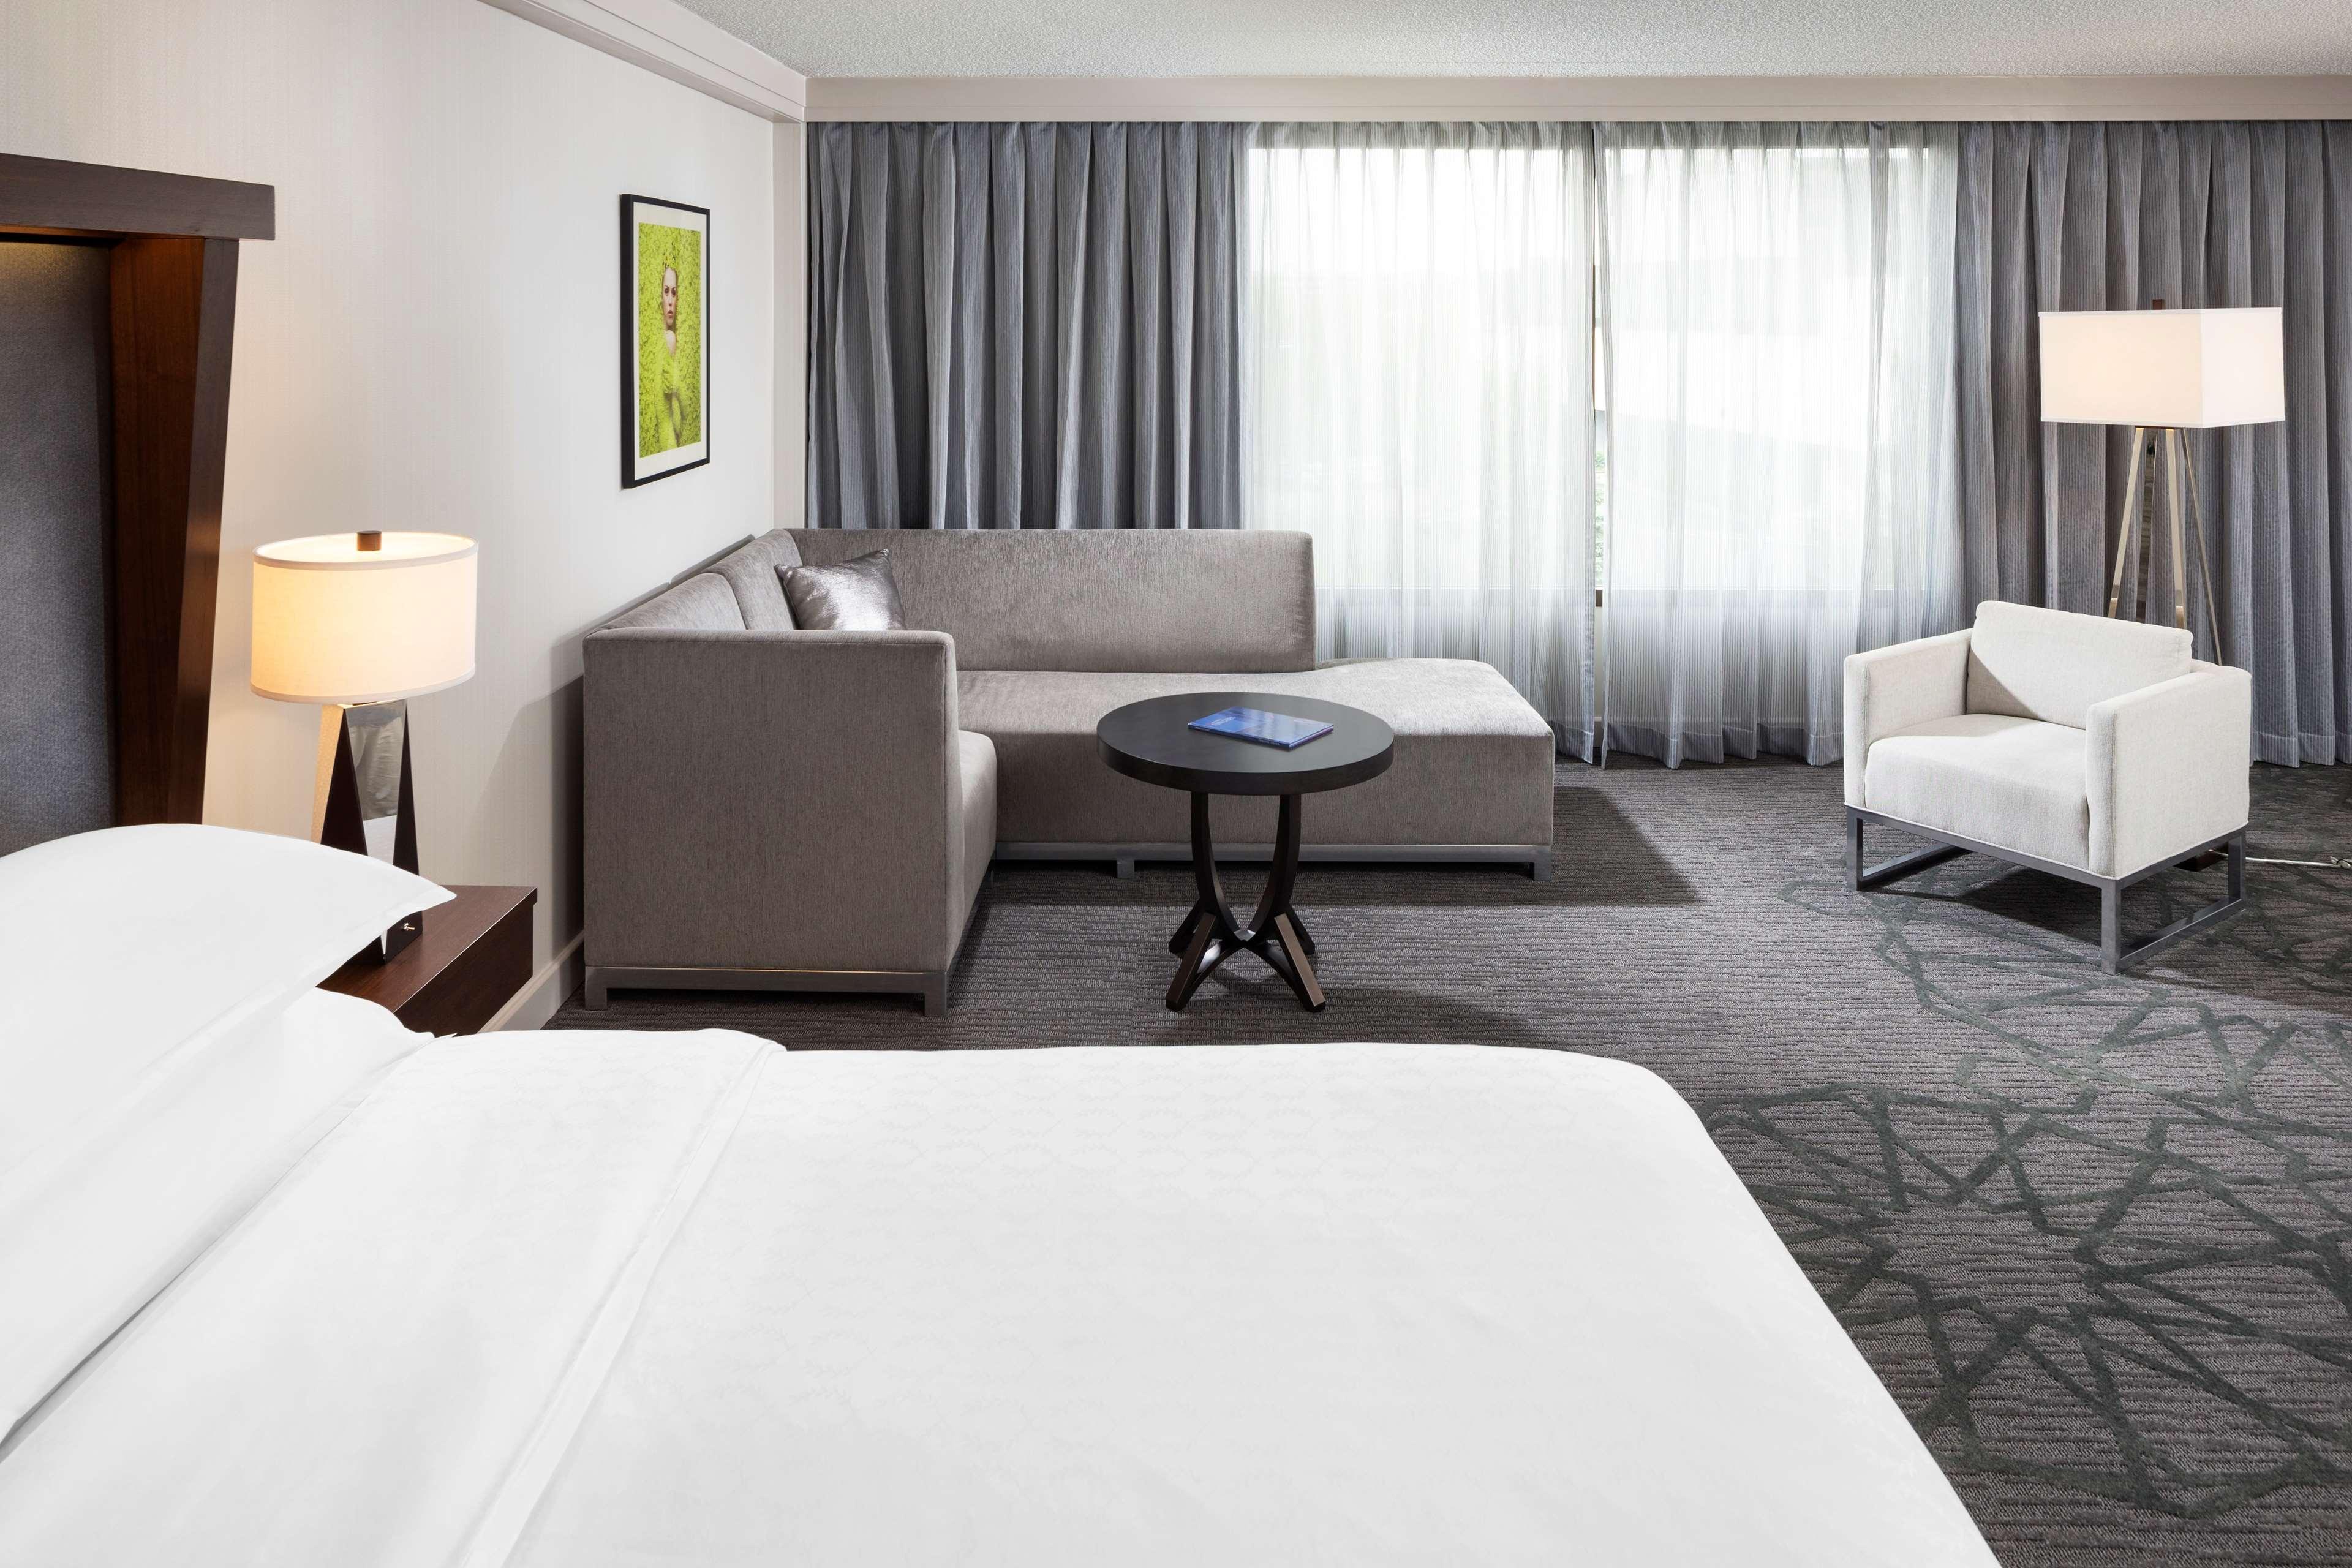 Sheraton Bloomington Hotel image 2